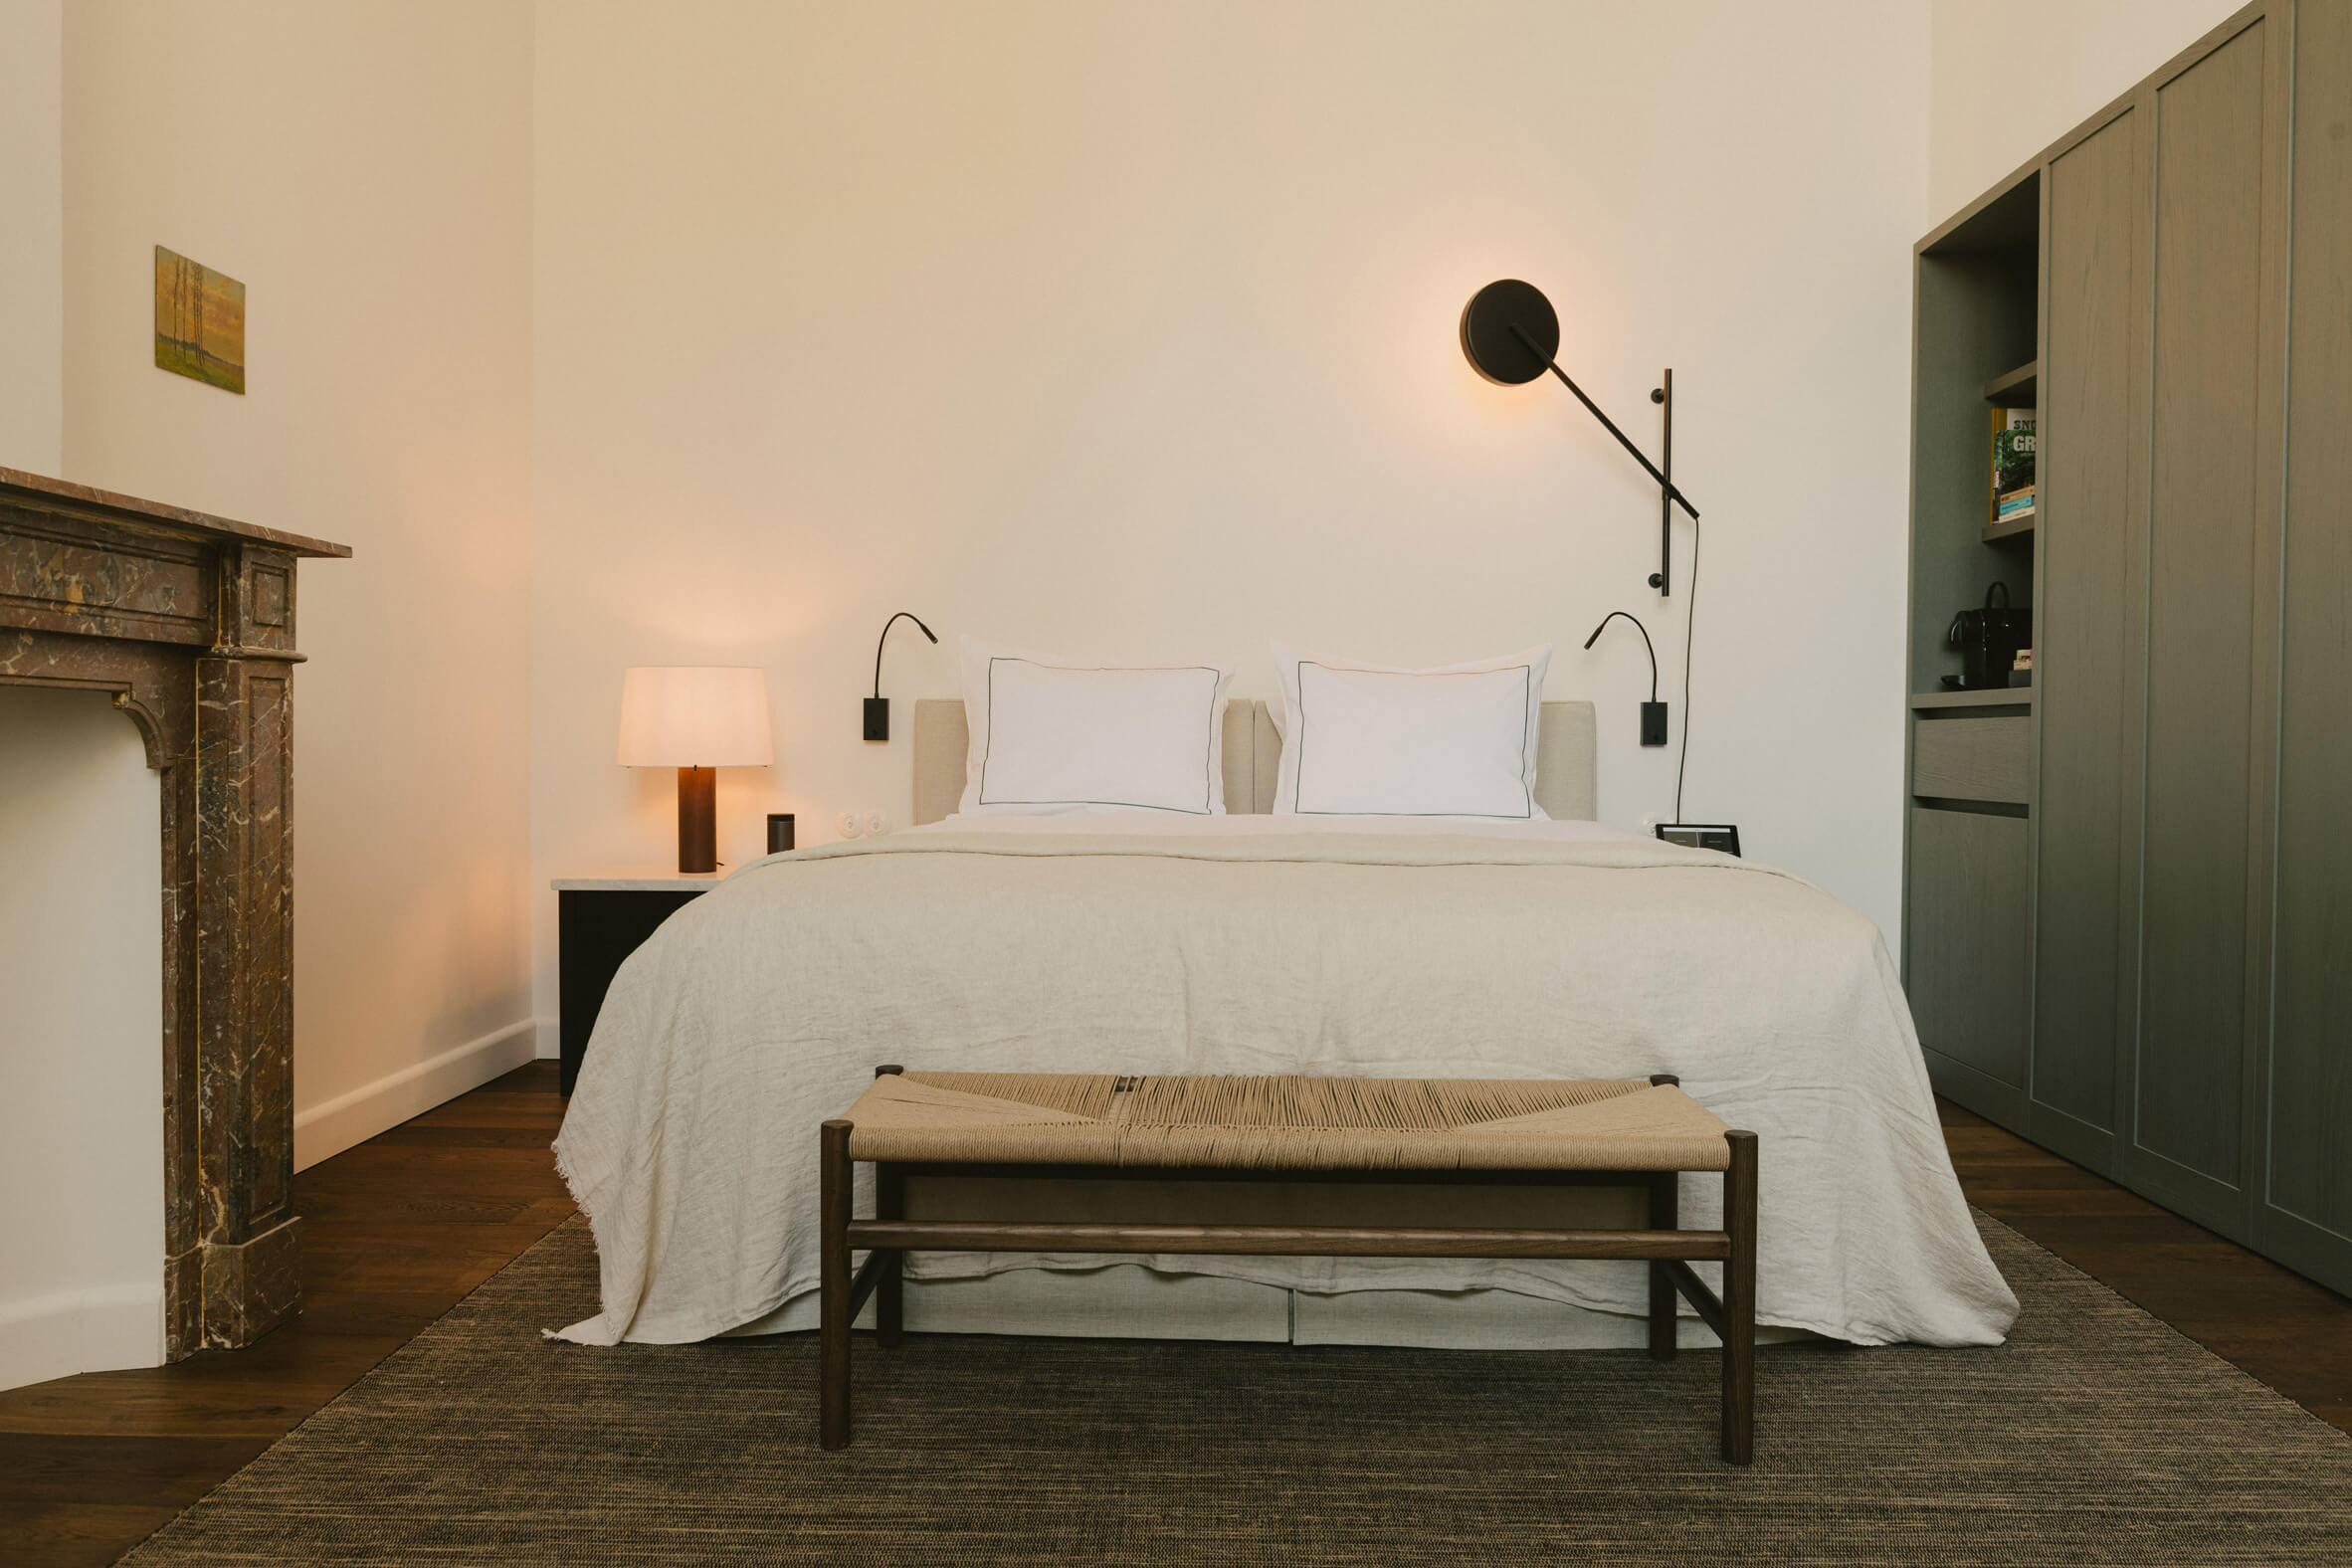 focus-archi-magazine-architectuur-archinews-august-hotel-04.jpg